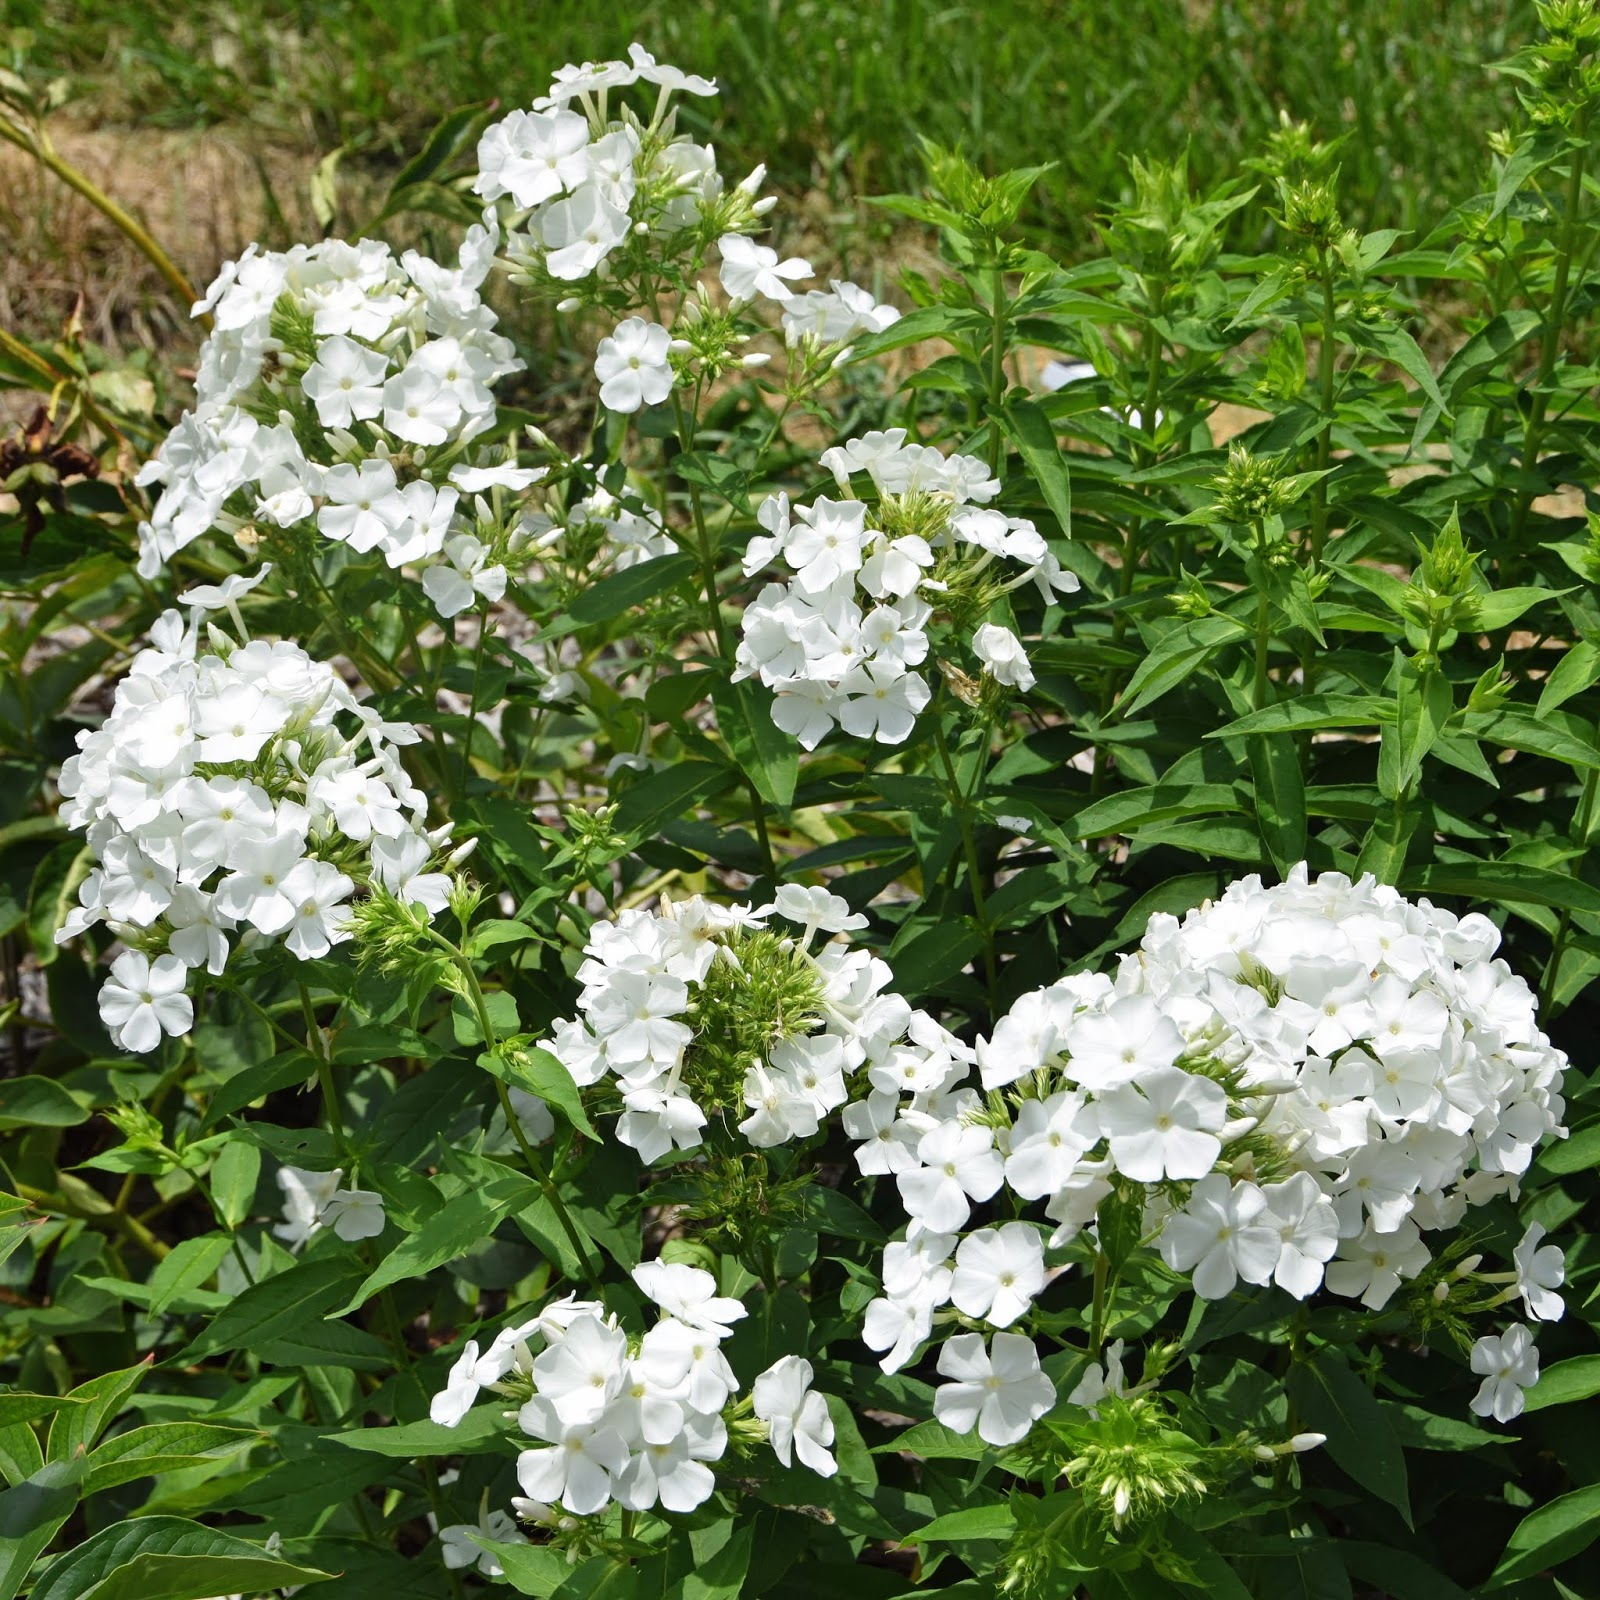 2018 peony companion plants tall garden phlox paniculata - Tall Garden Phlox